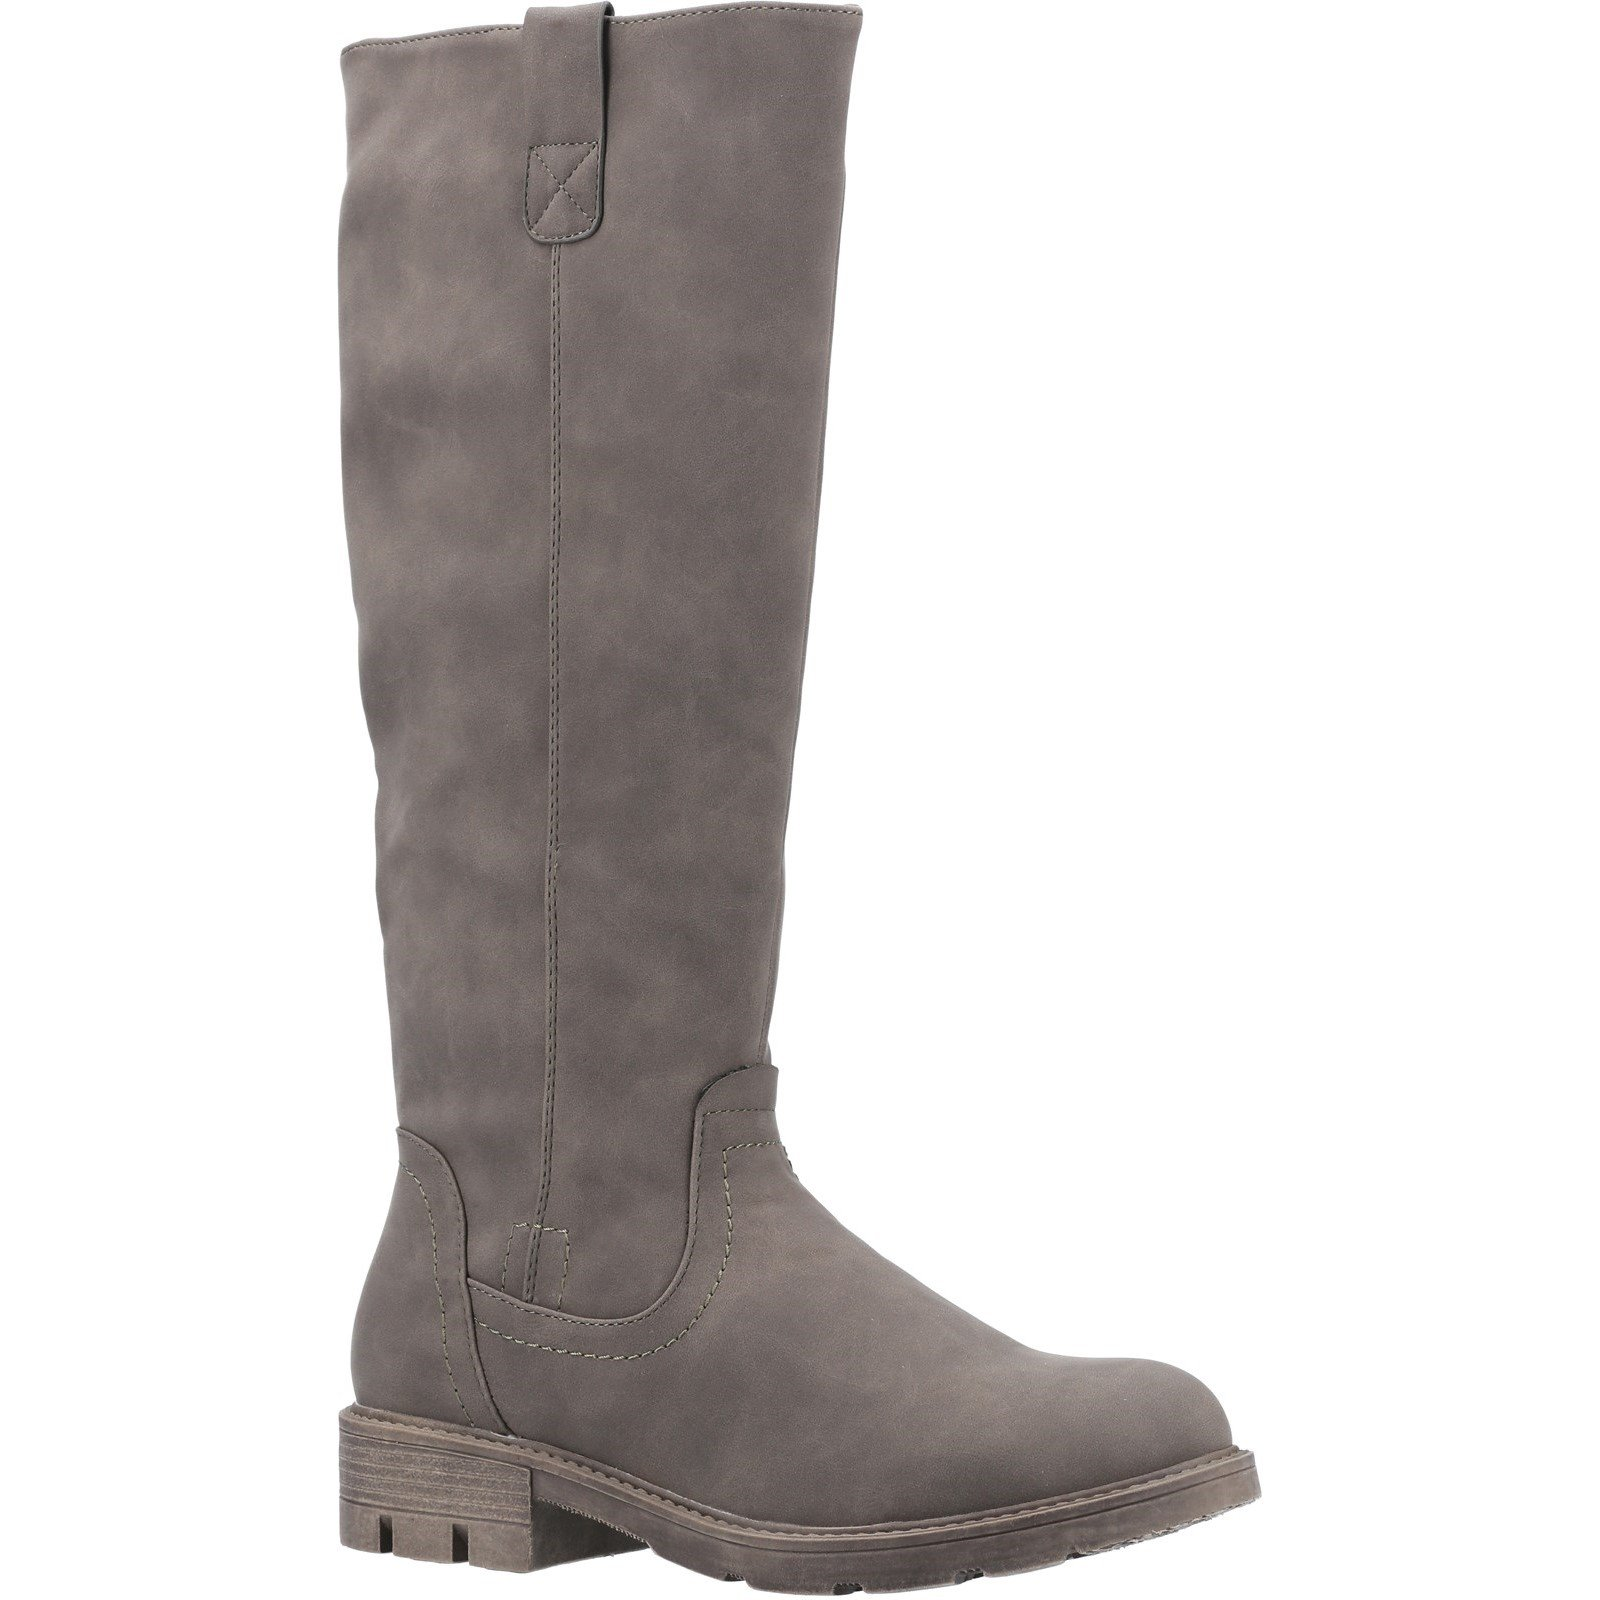 Divaz Women's Quinn Knee High Boot Various Colours 31080 - Olive 3